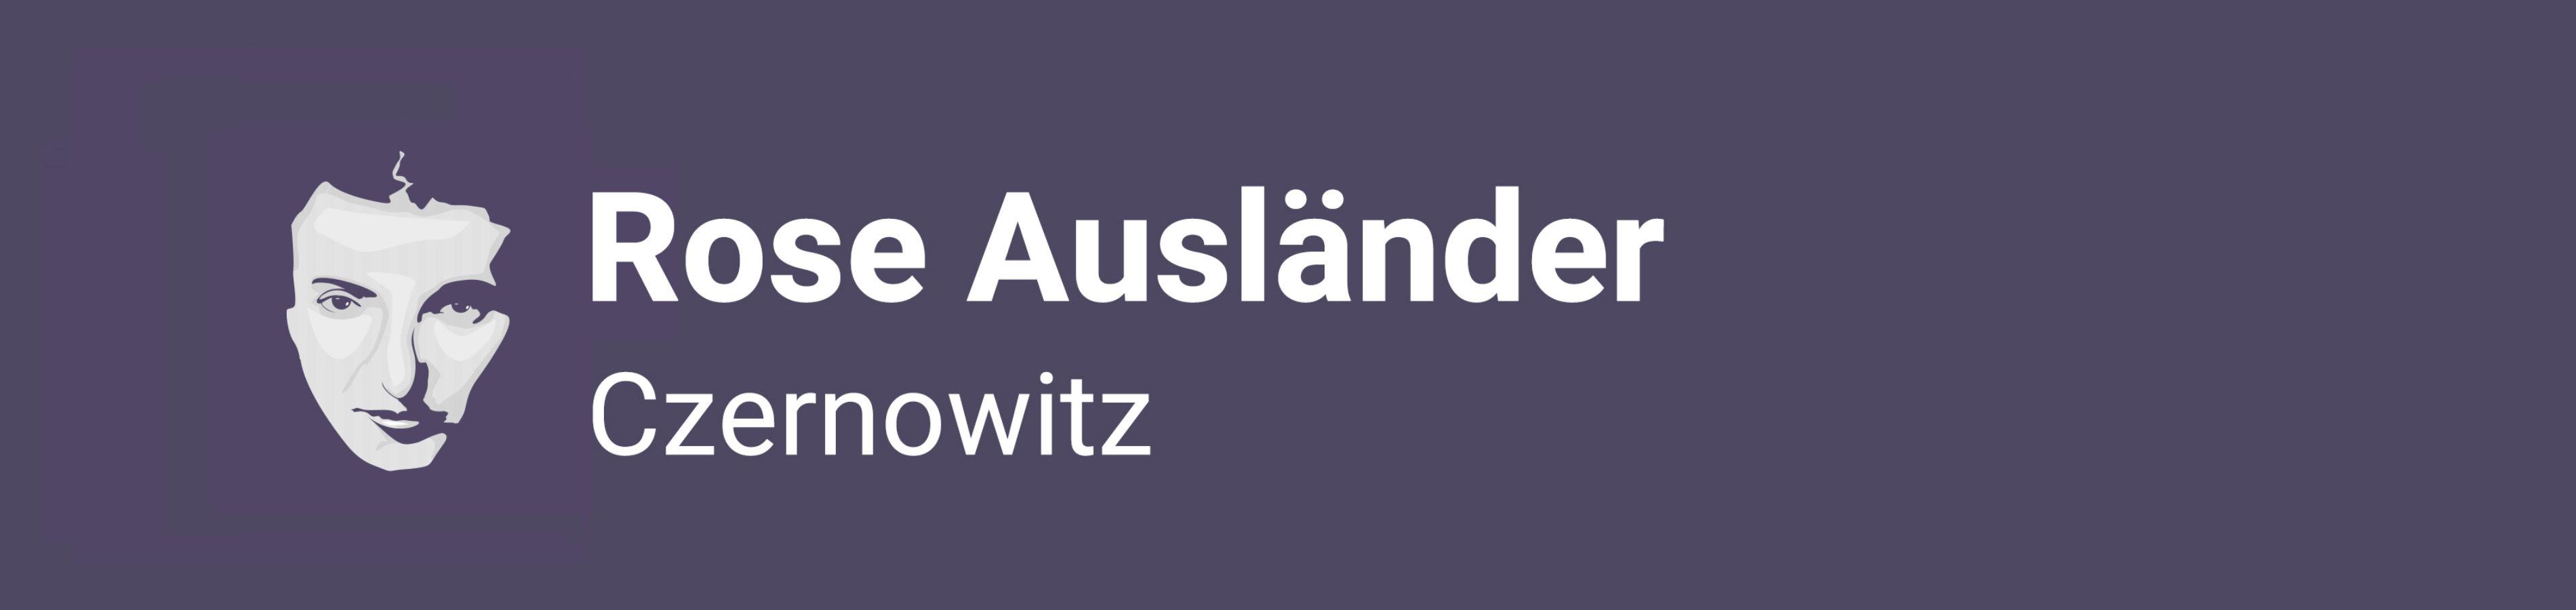 http://www.bukgalstrasse.com/wp-content/uploads/2018/06/Rose_Ausländer333-3800x900.jpg